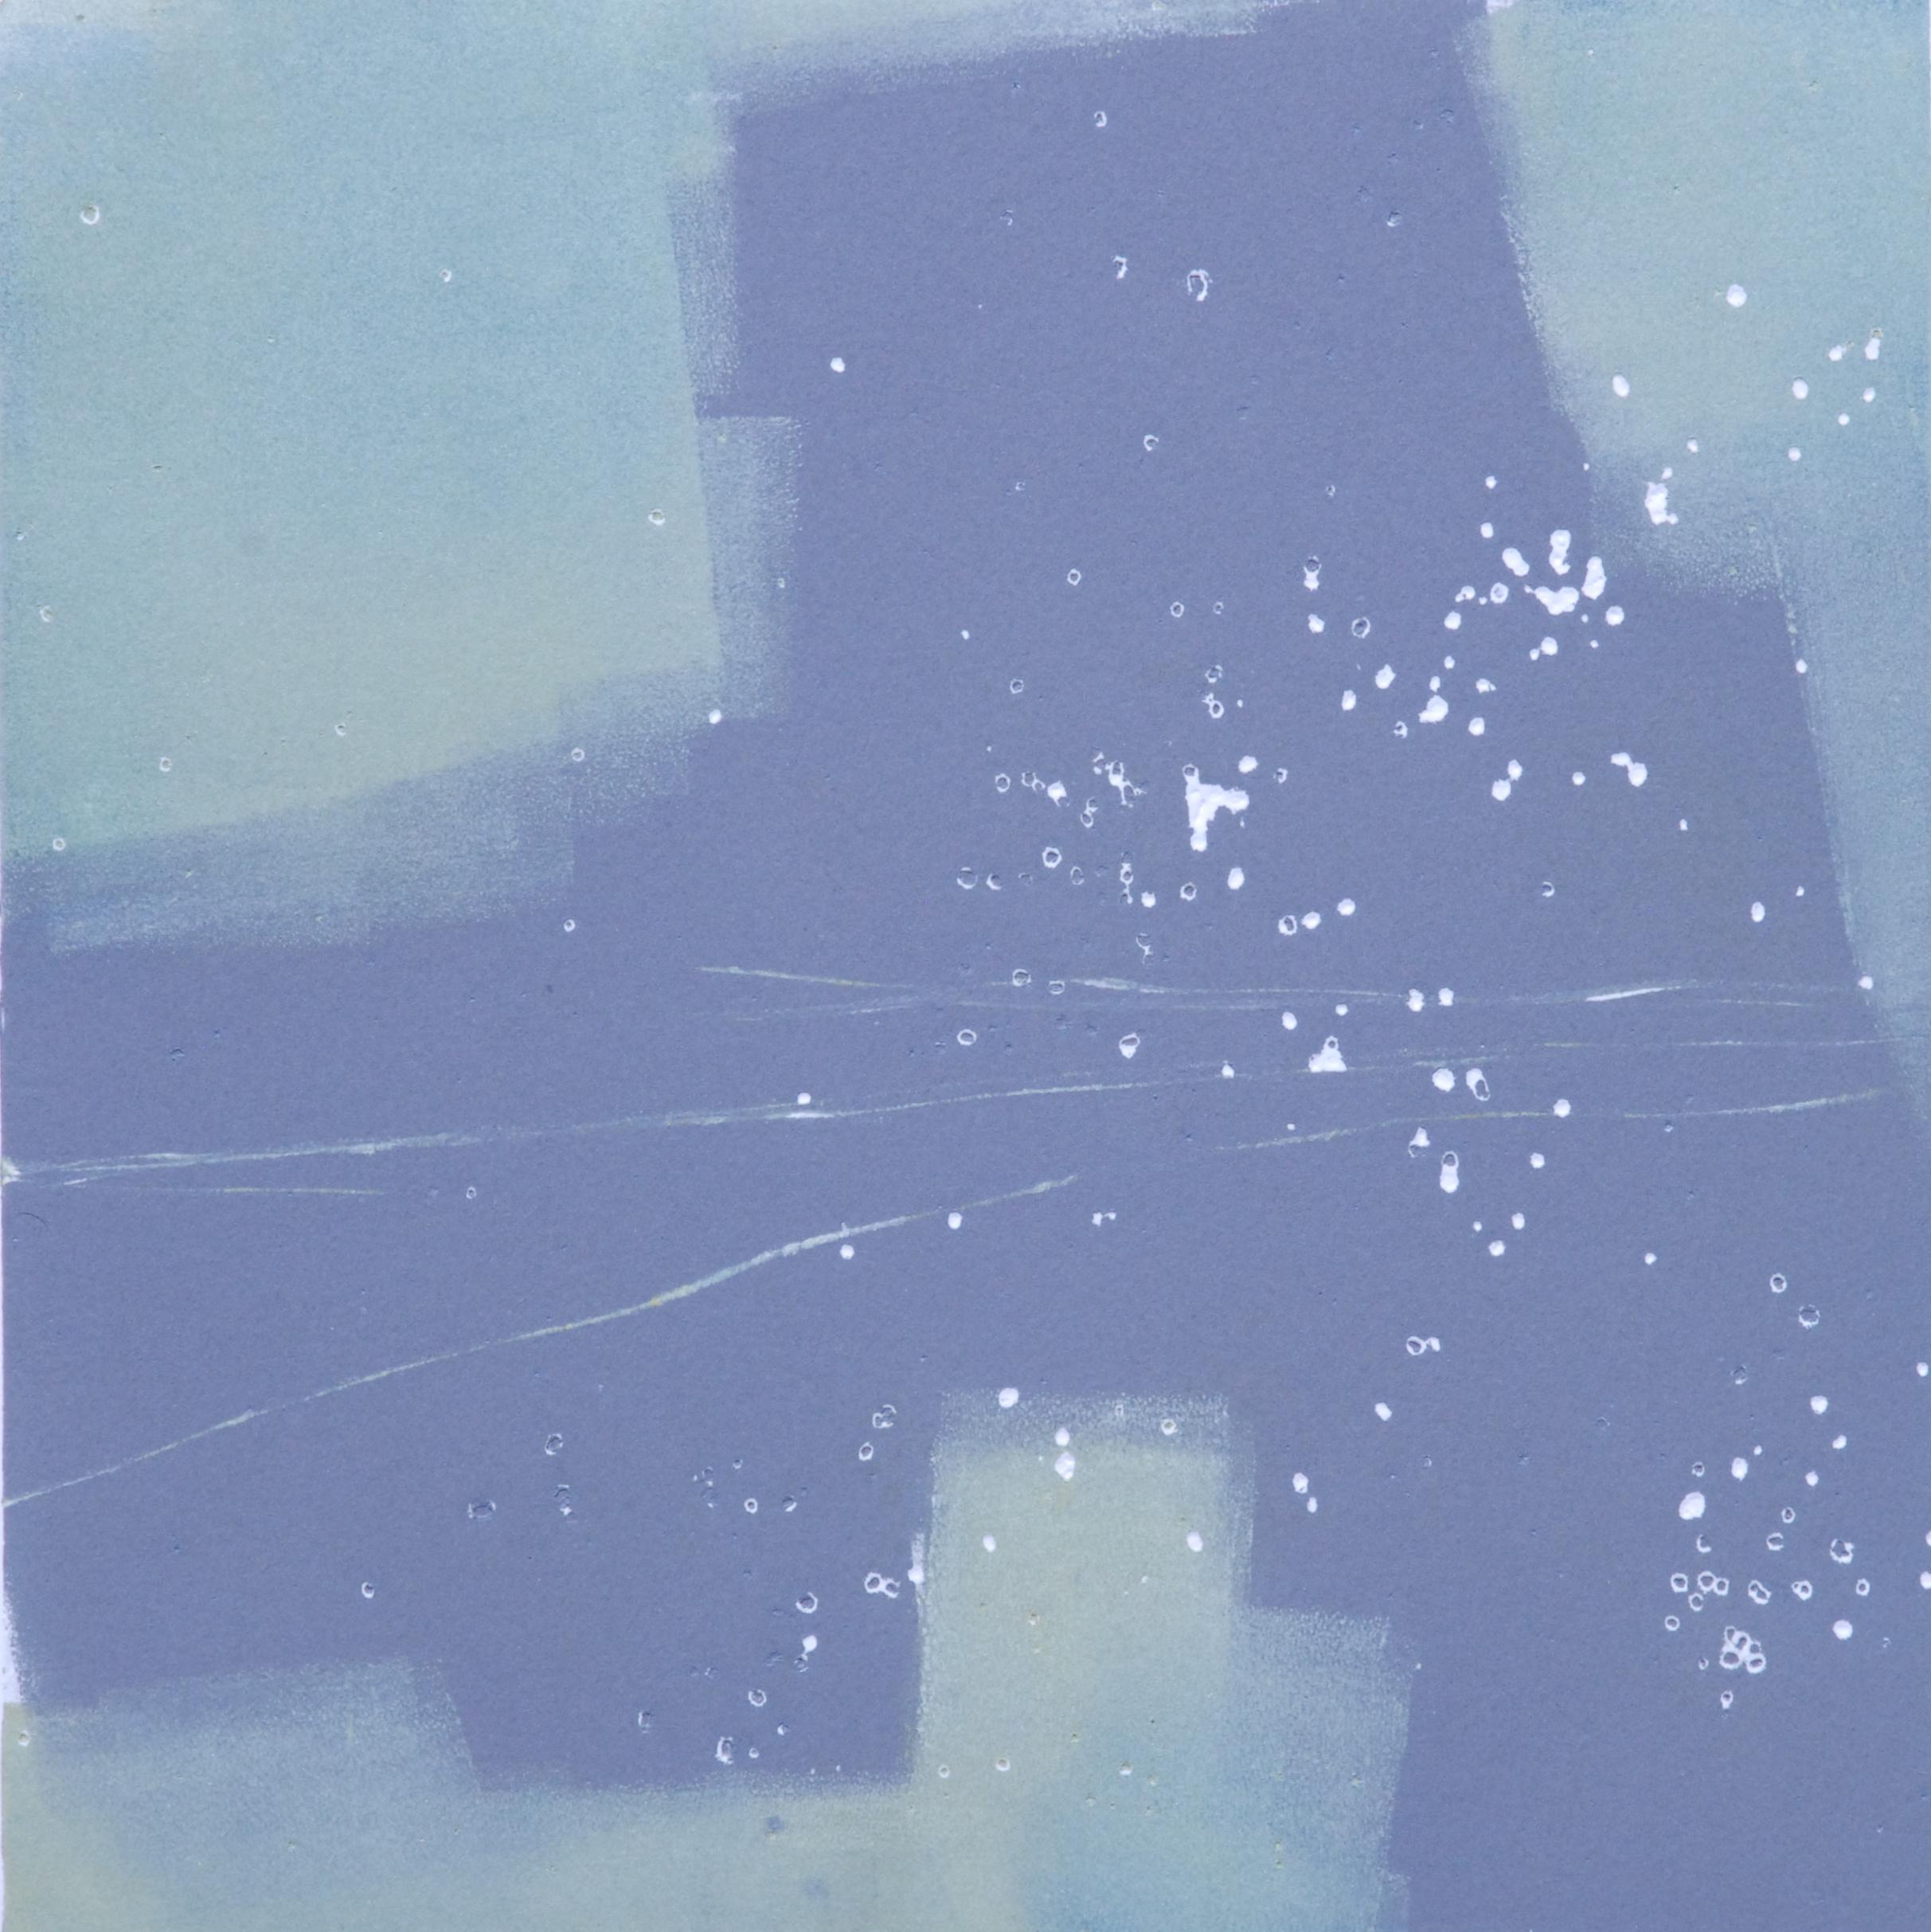 "Sodium Deviation 9, 2016  monoprint  10"" x 10"" image on 11"" x 14"" paper"